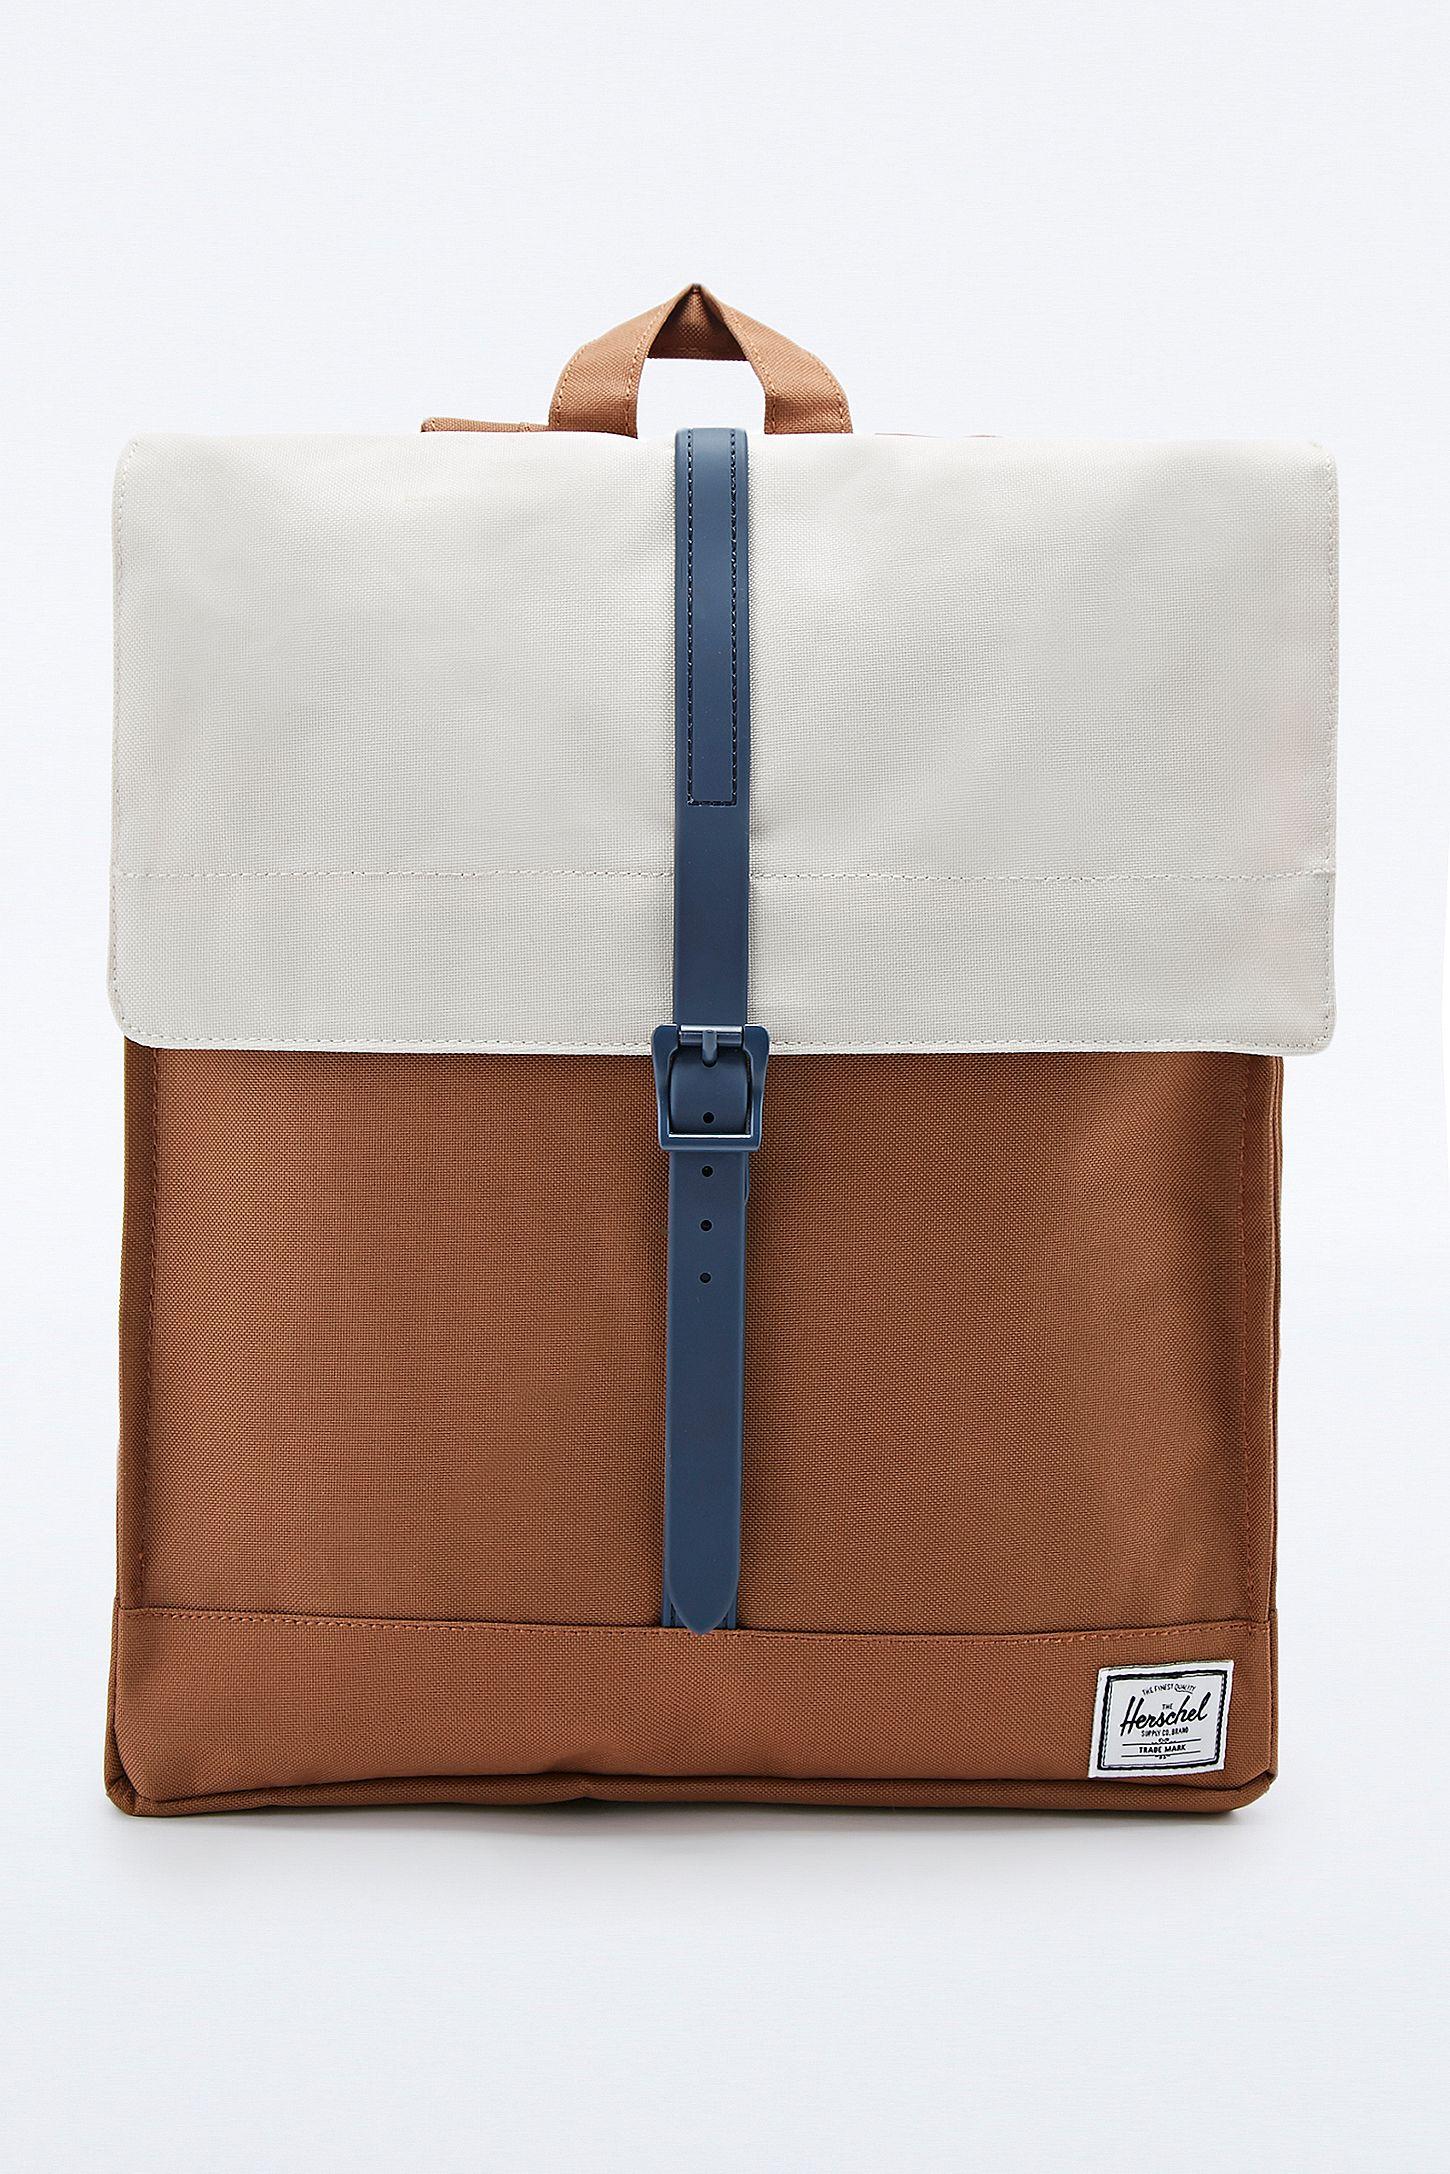 Herschel Supply co. City Backpack in Caramel  0556177e15d01